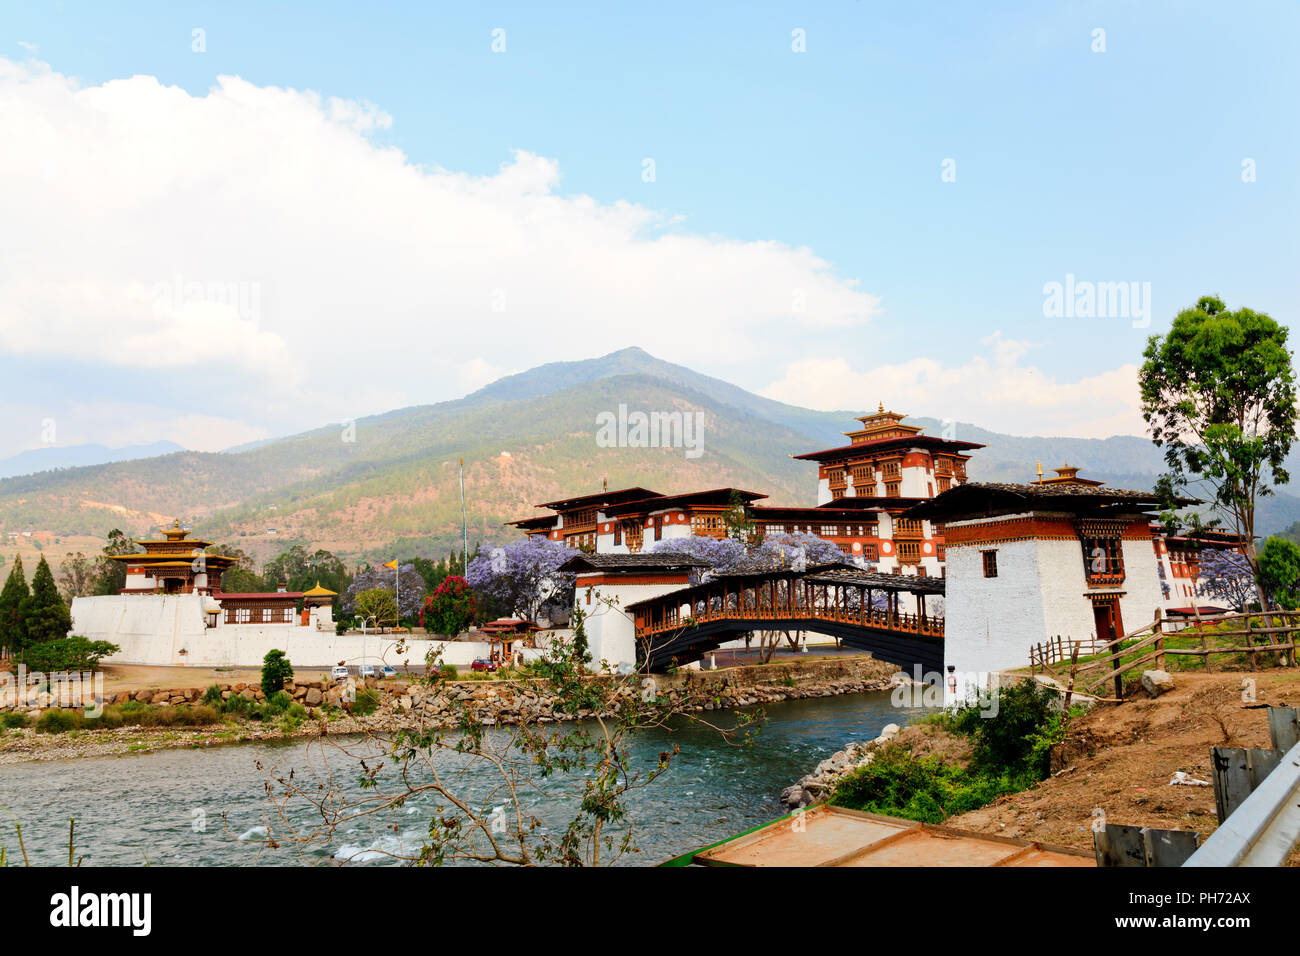 Punakha dzong with wooden cantilever bridge - Stock Image